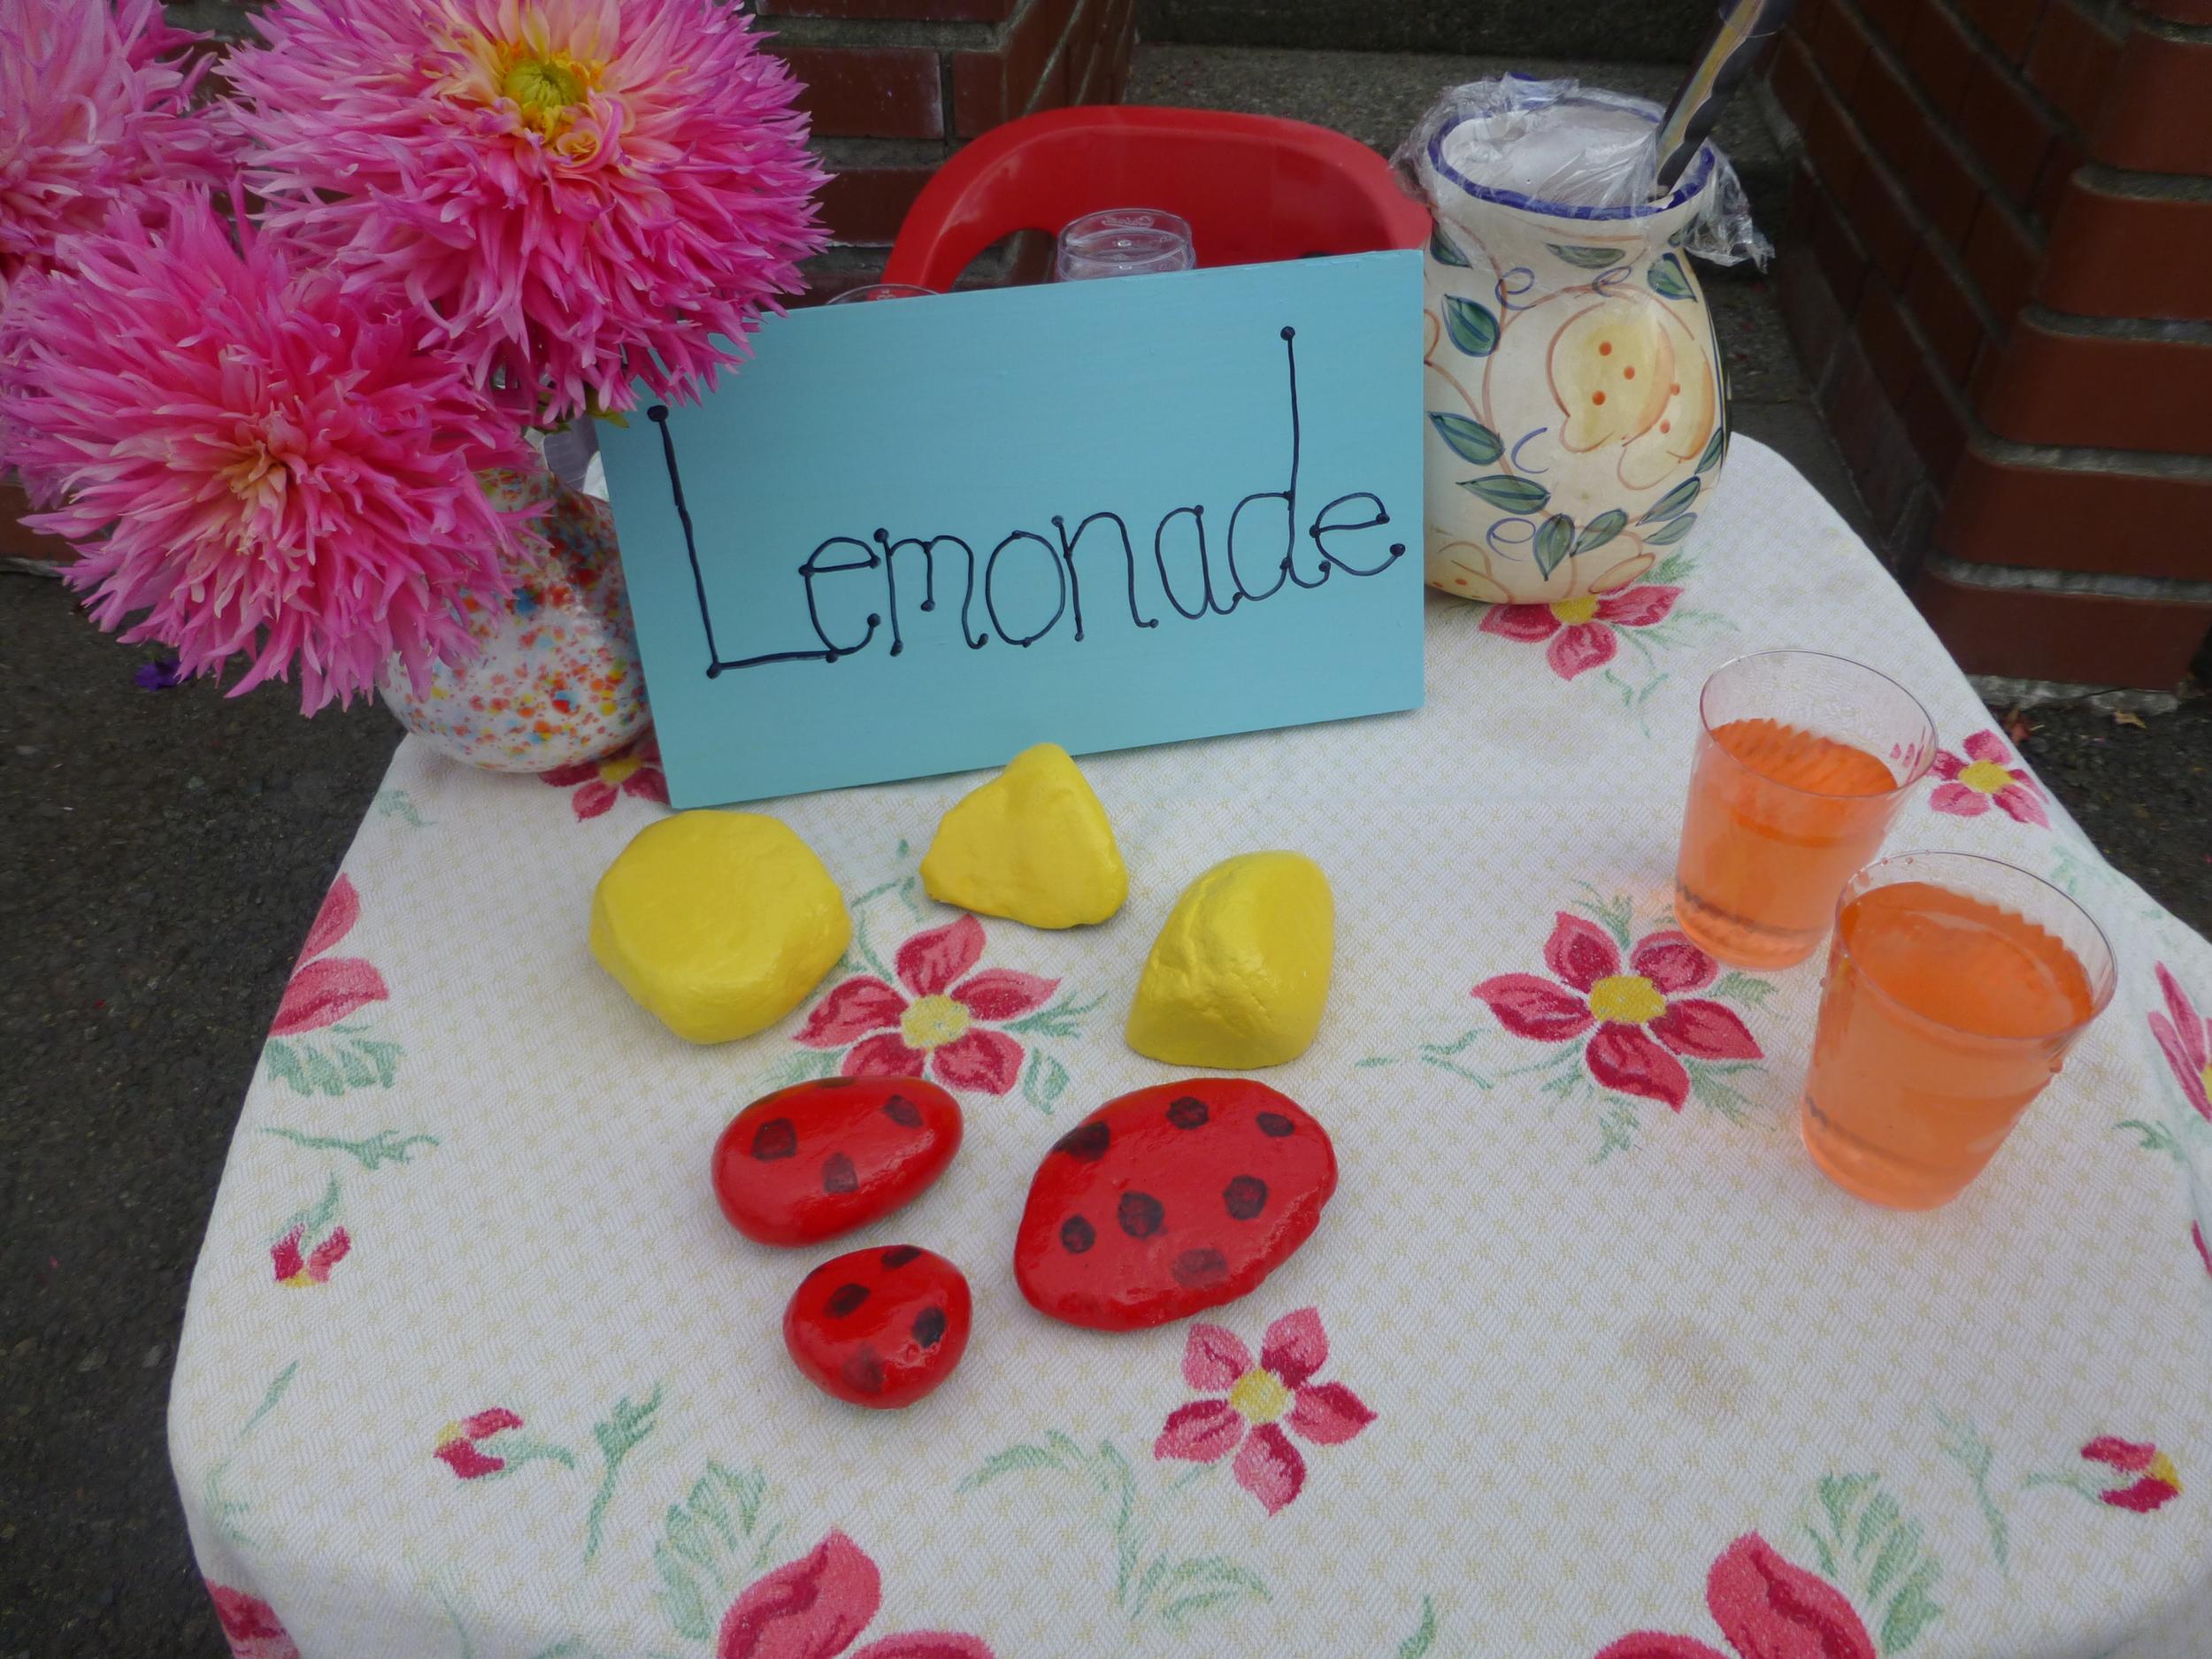 Get your fresh lemonade!